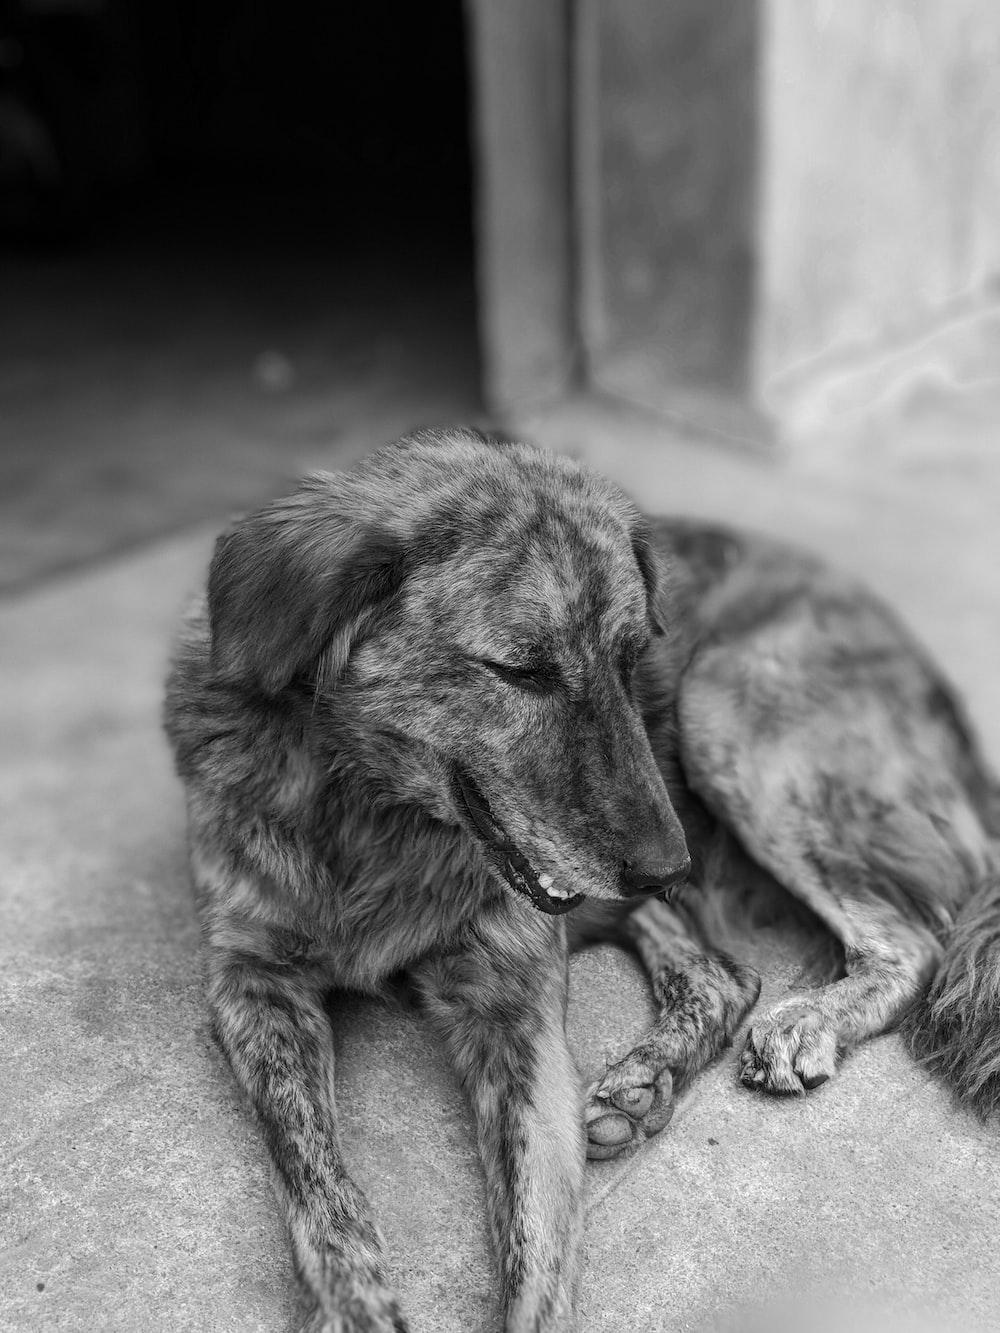 gray dog lying on ground